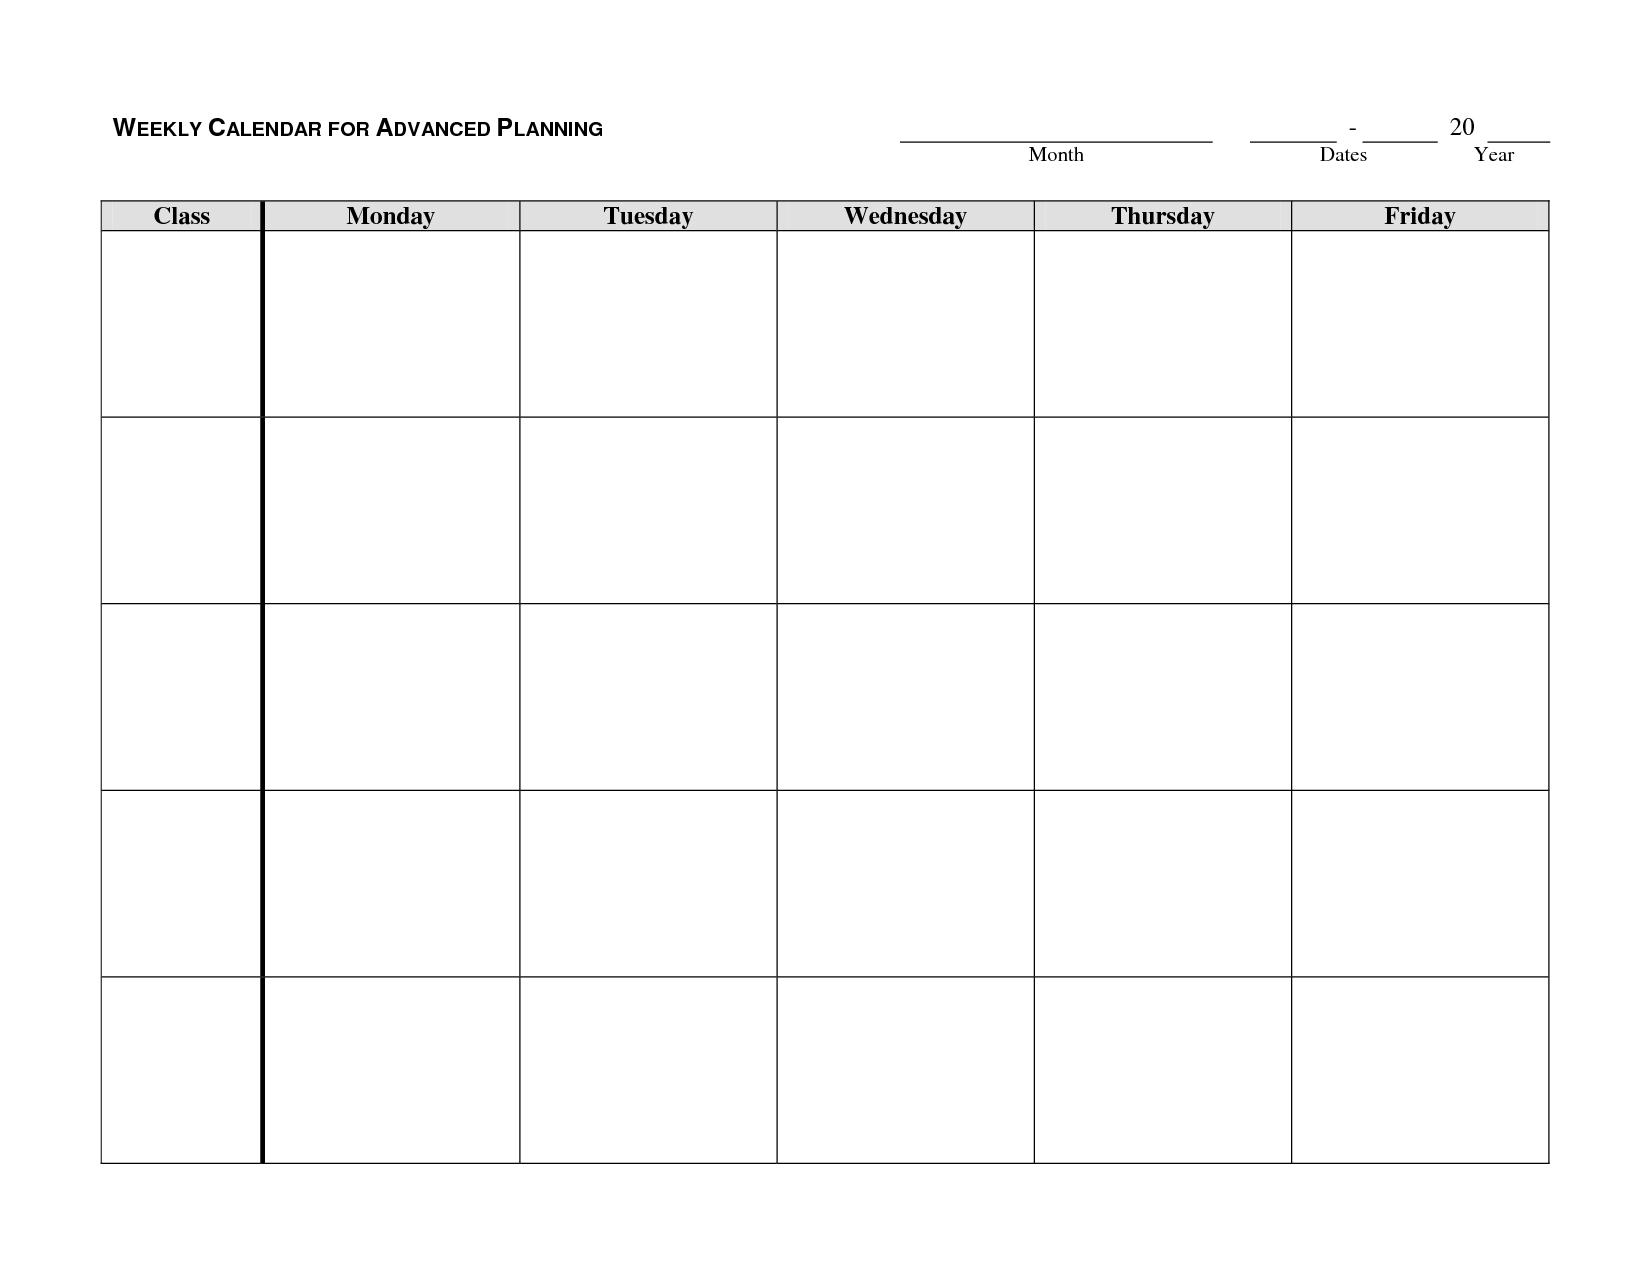 Monday Through Friday Blank Schedule Print Out – Calendar Printable Monday To Friday Calendar